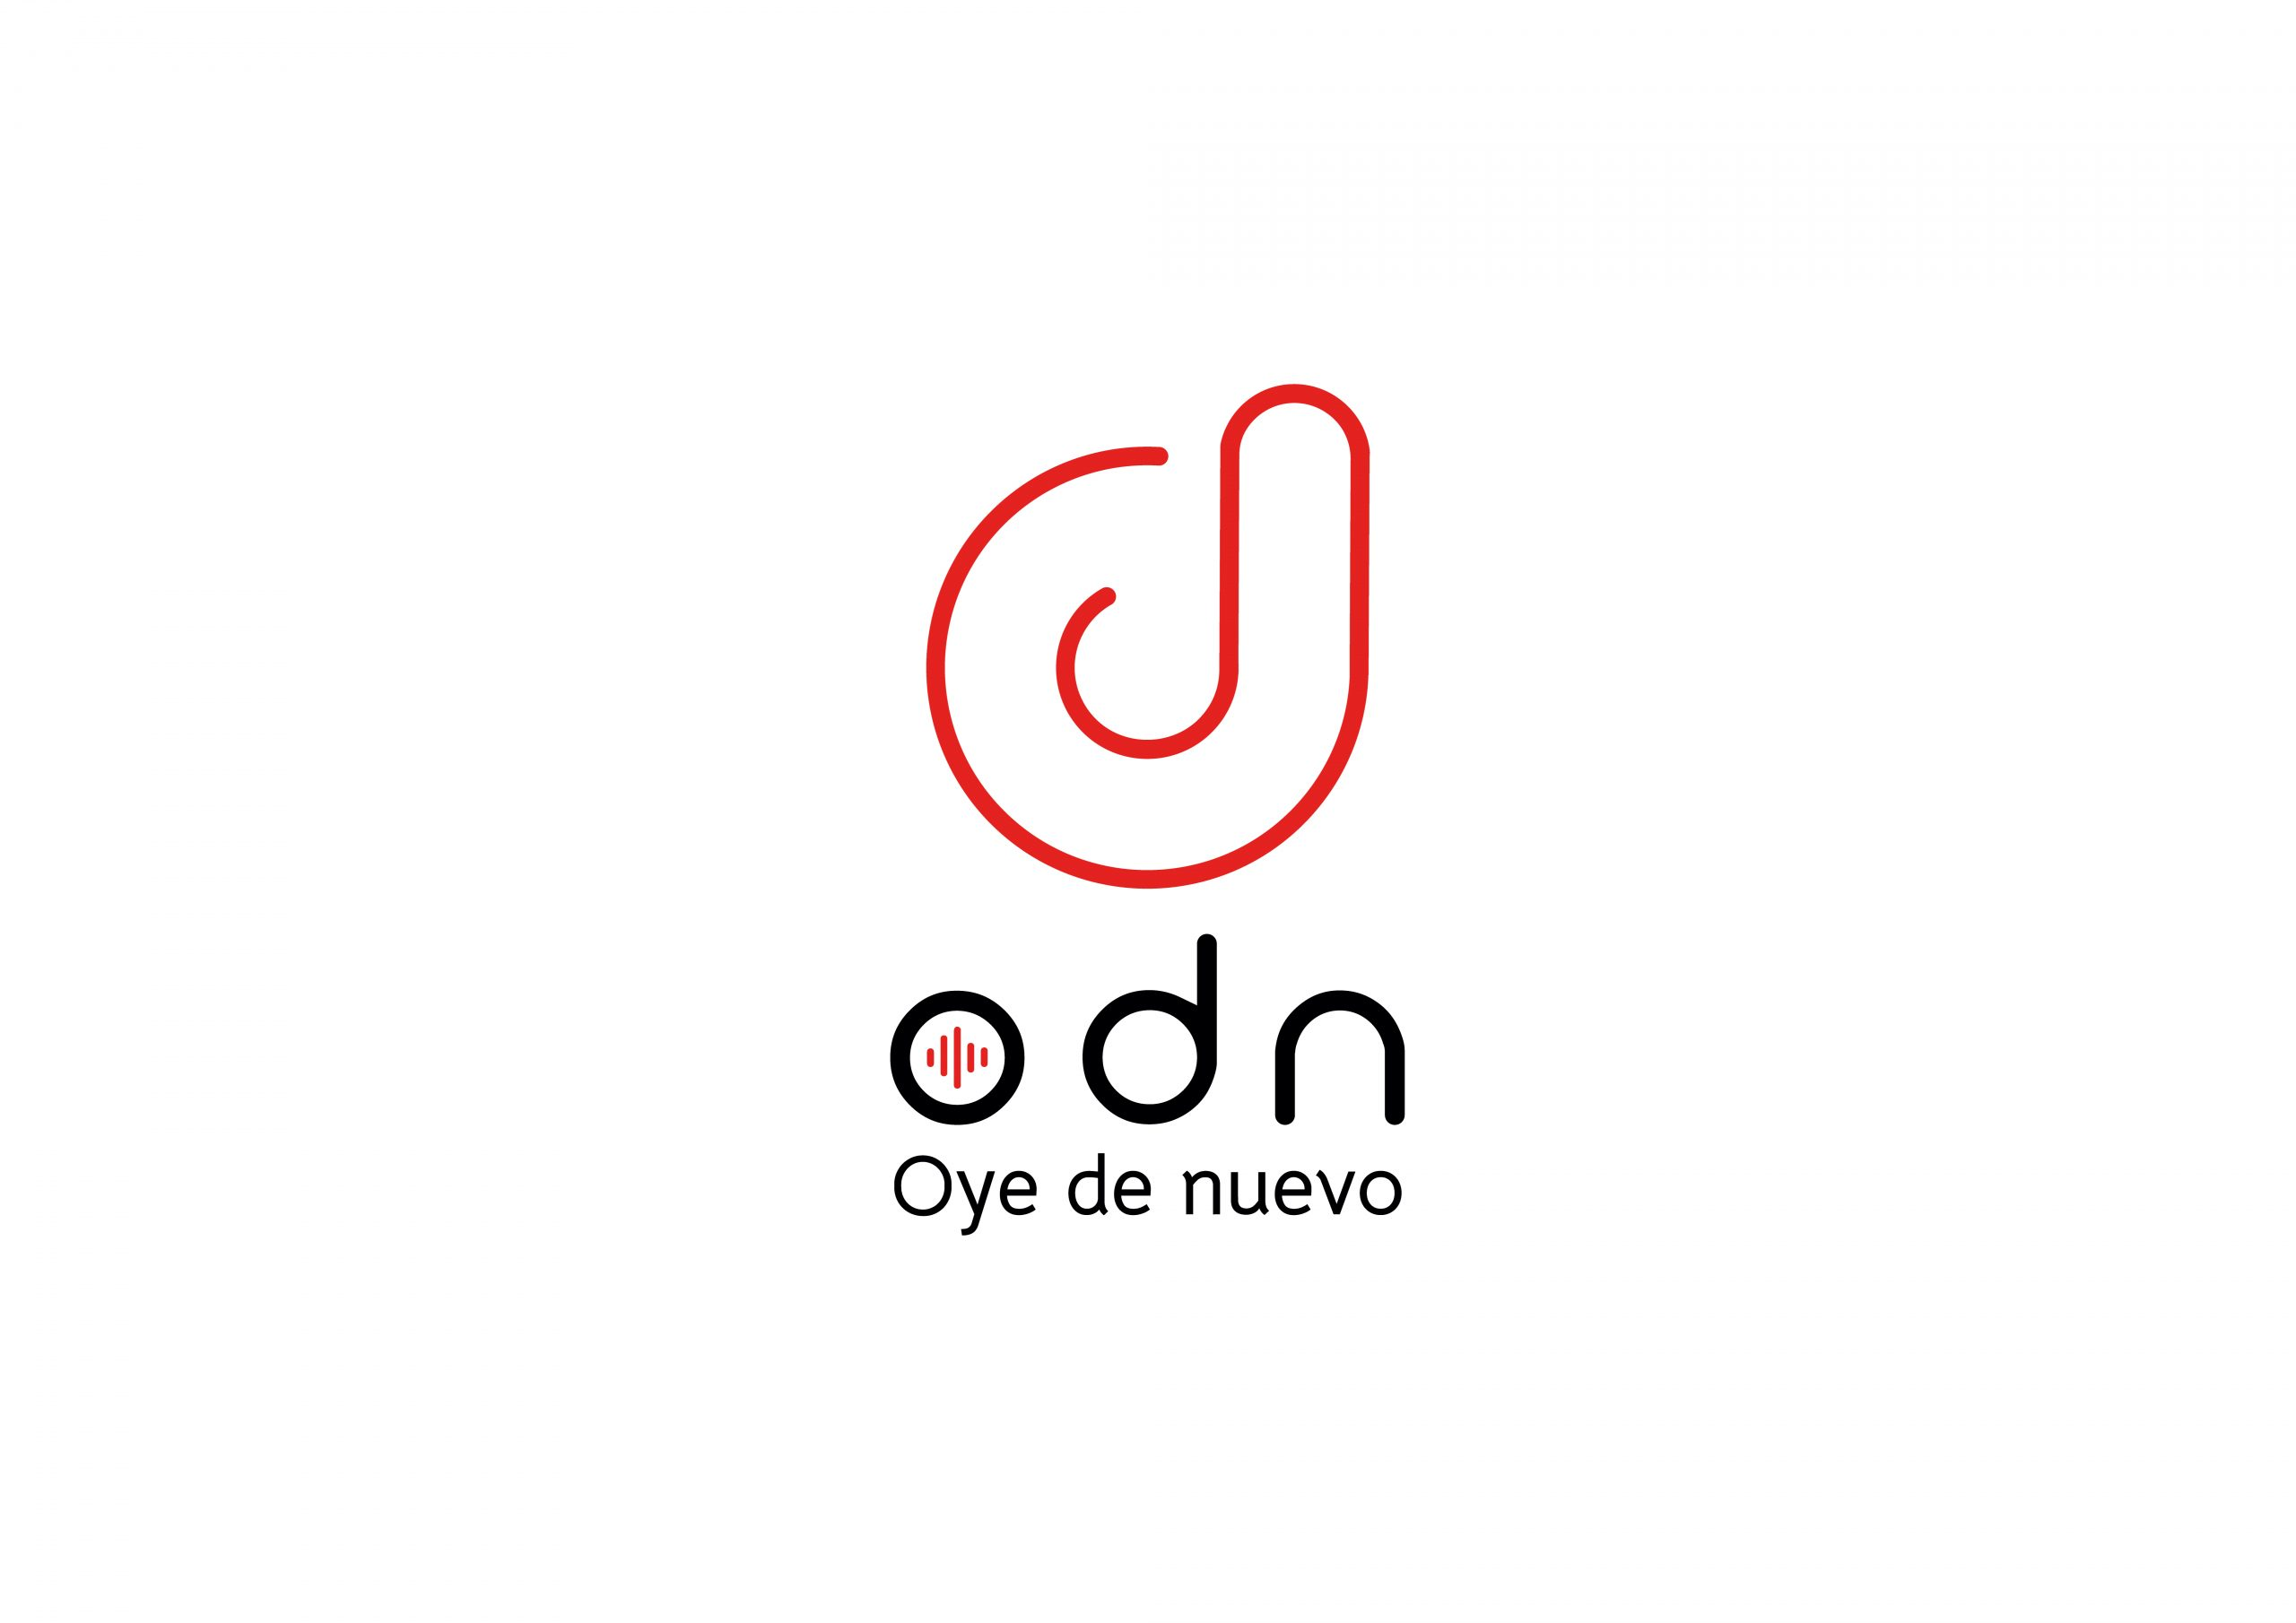 OYE DE NUEVO